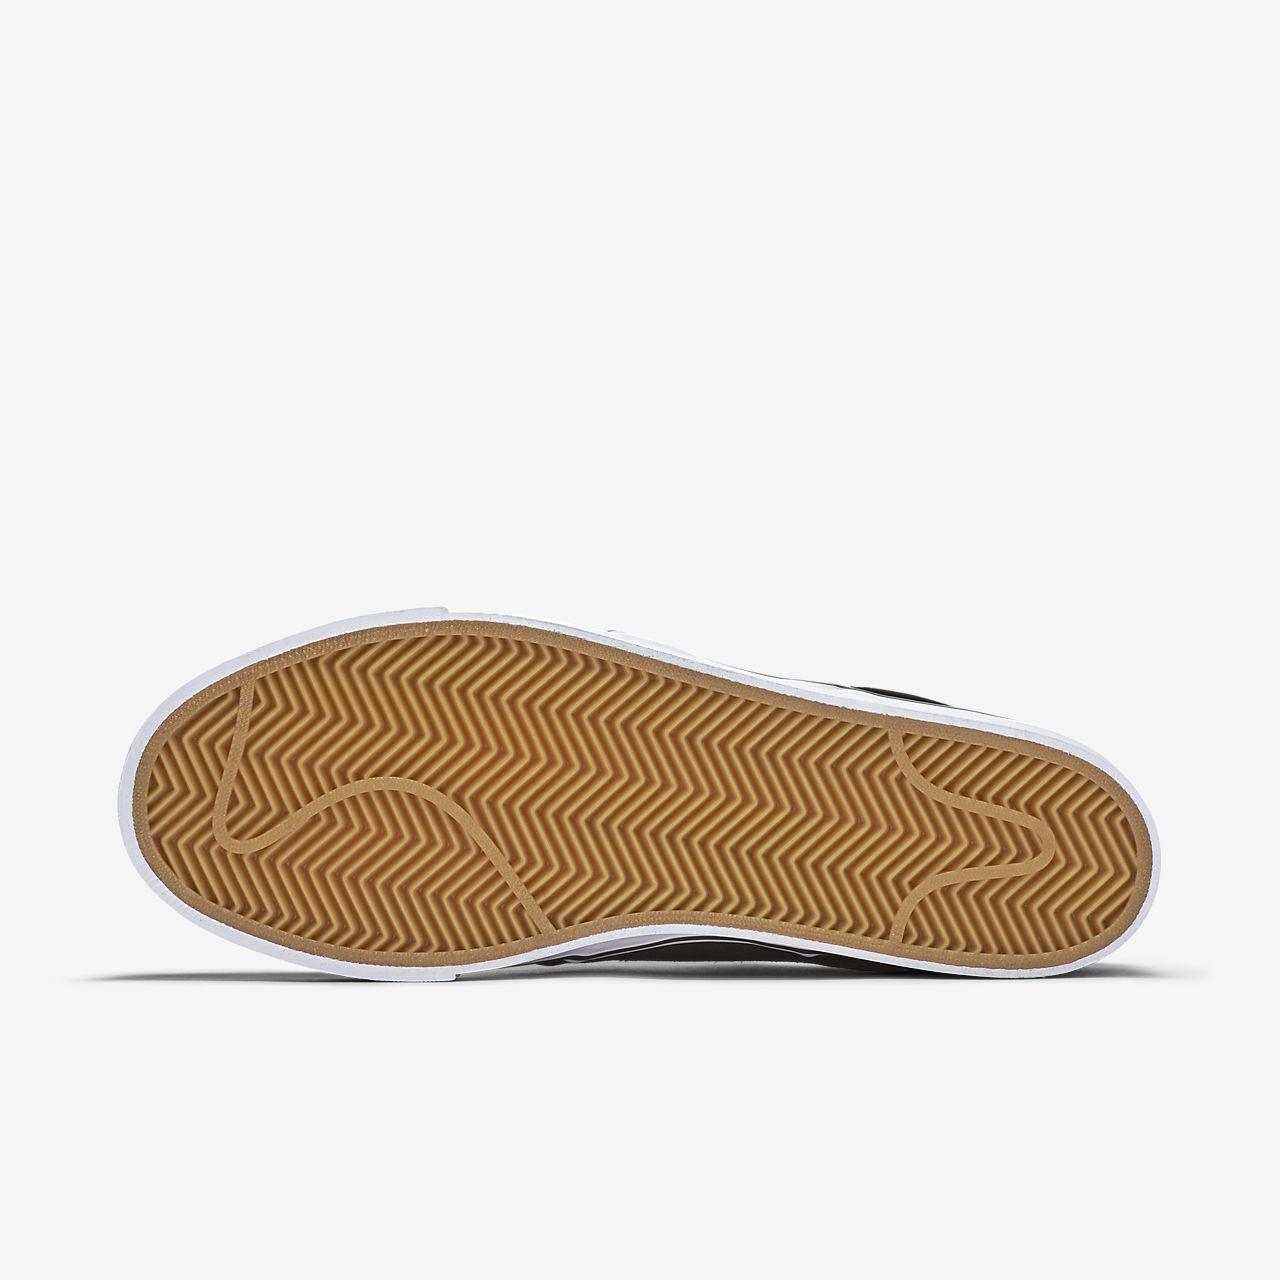 check out e4798 b05a1 ... Nike SB Zoom Stefan Janoski OG Men s Skate Shoe